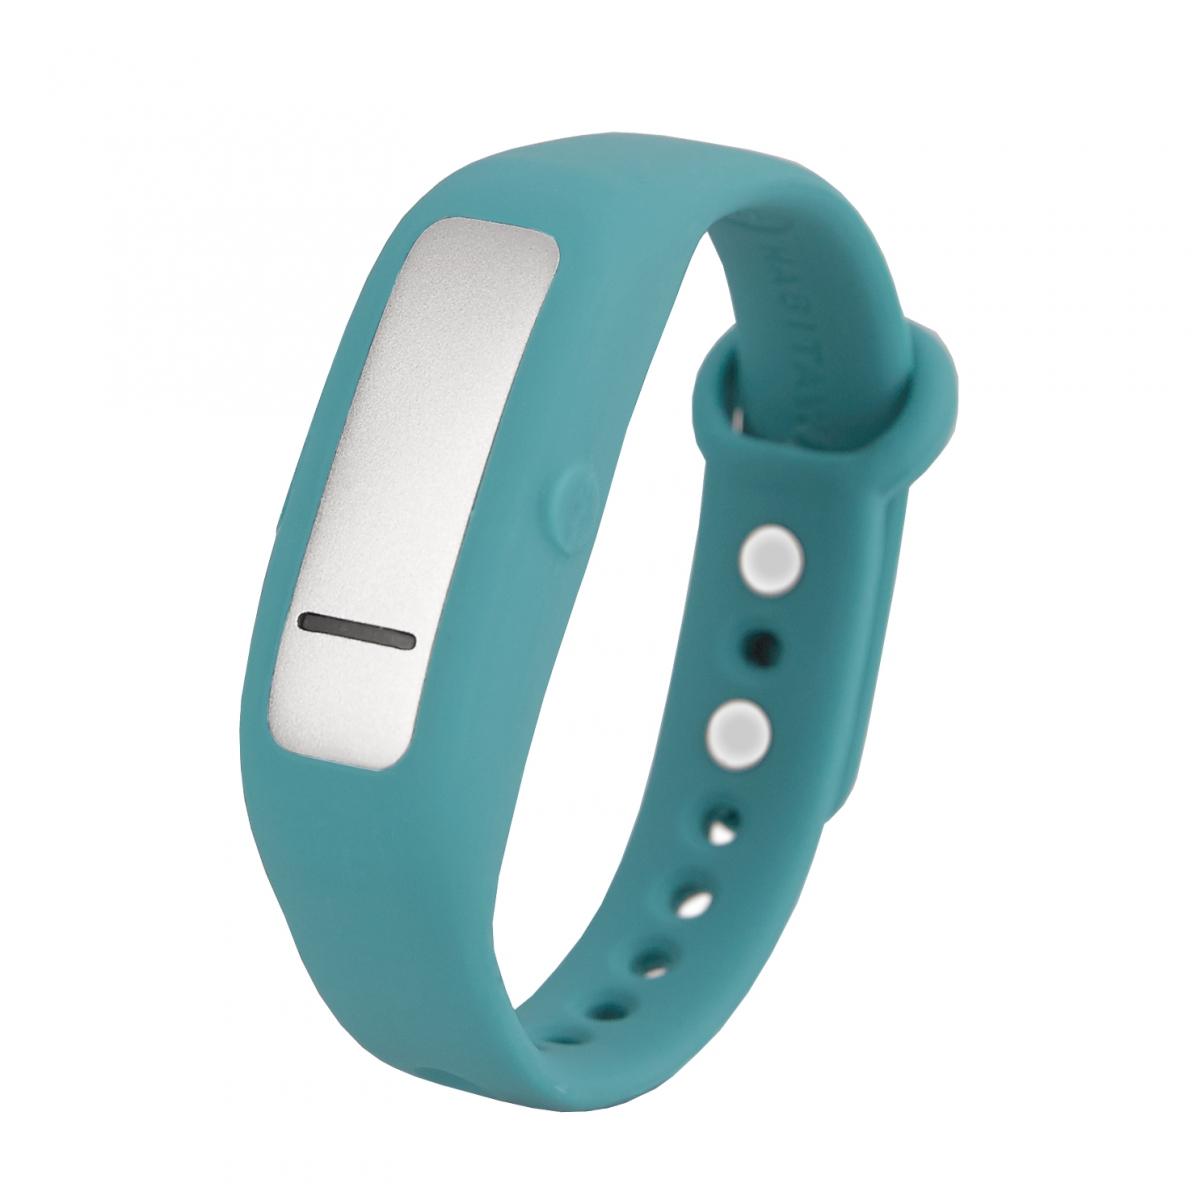 HabitAware's Keen bracelet, teal sporty model. Photo courtesy HabitAware.